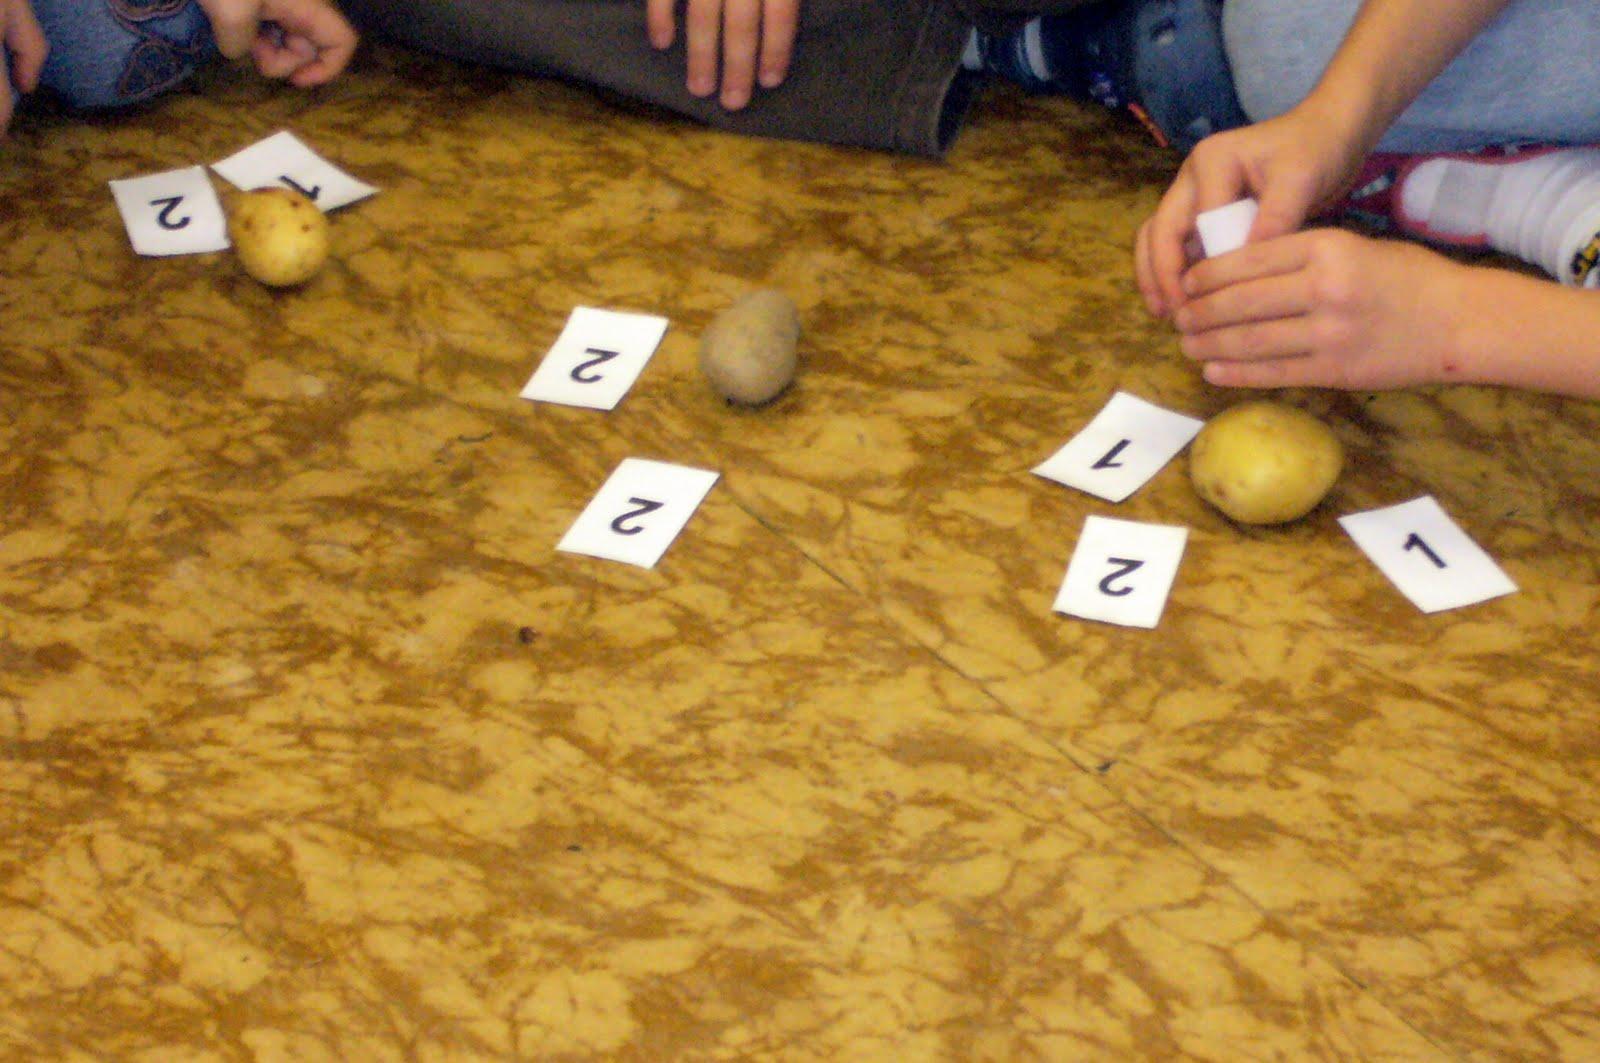 bramborovy_den-10.JPG